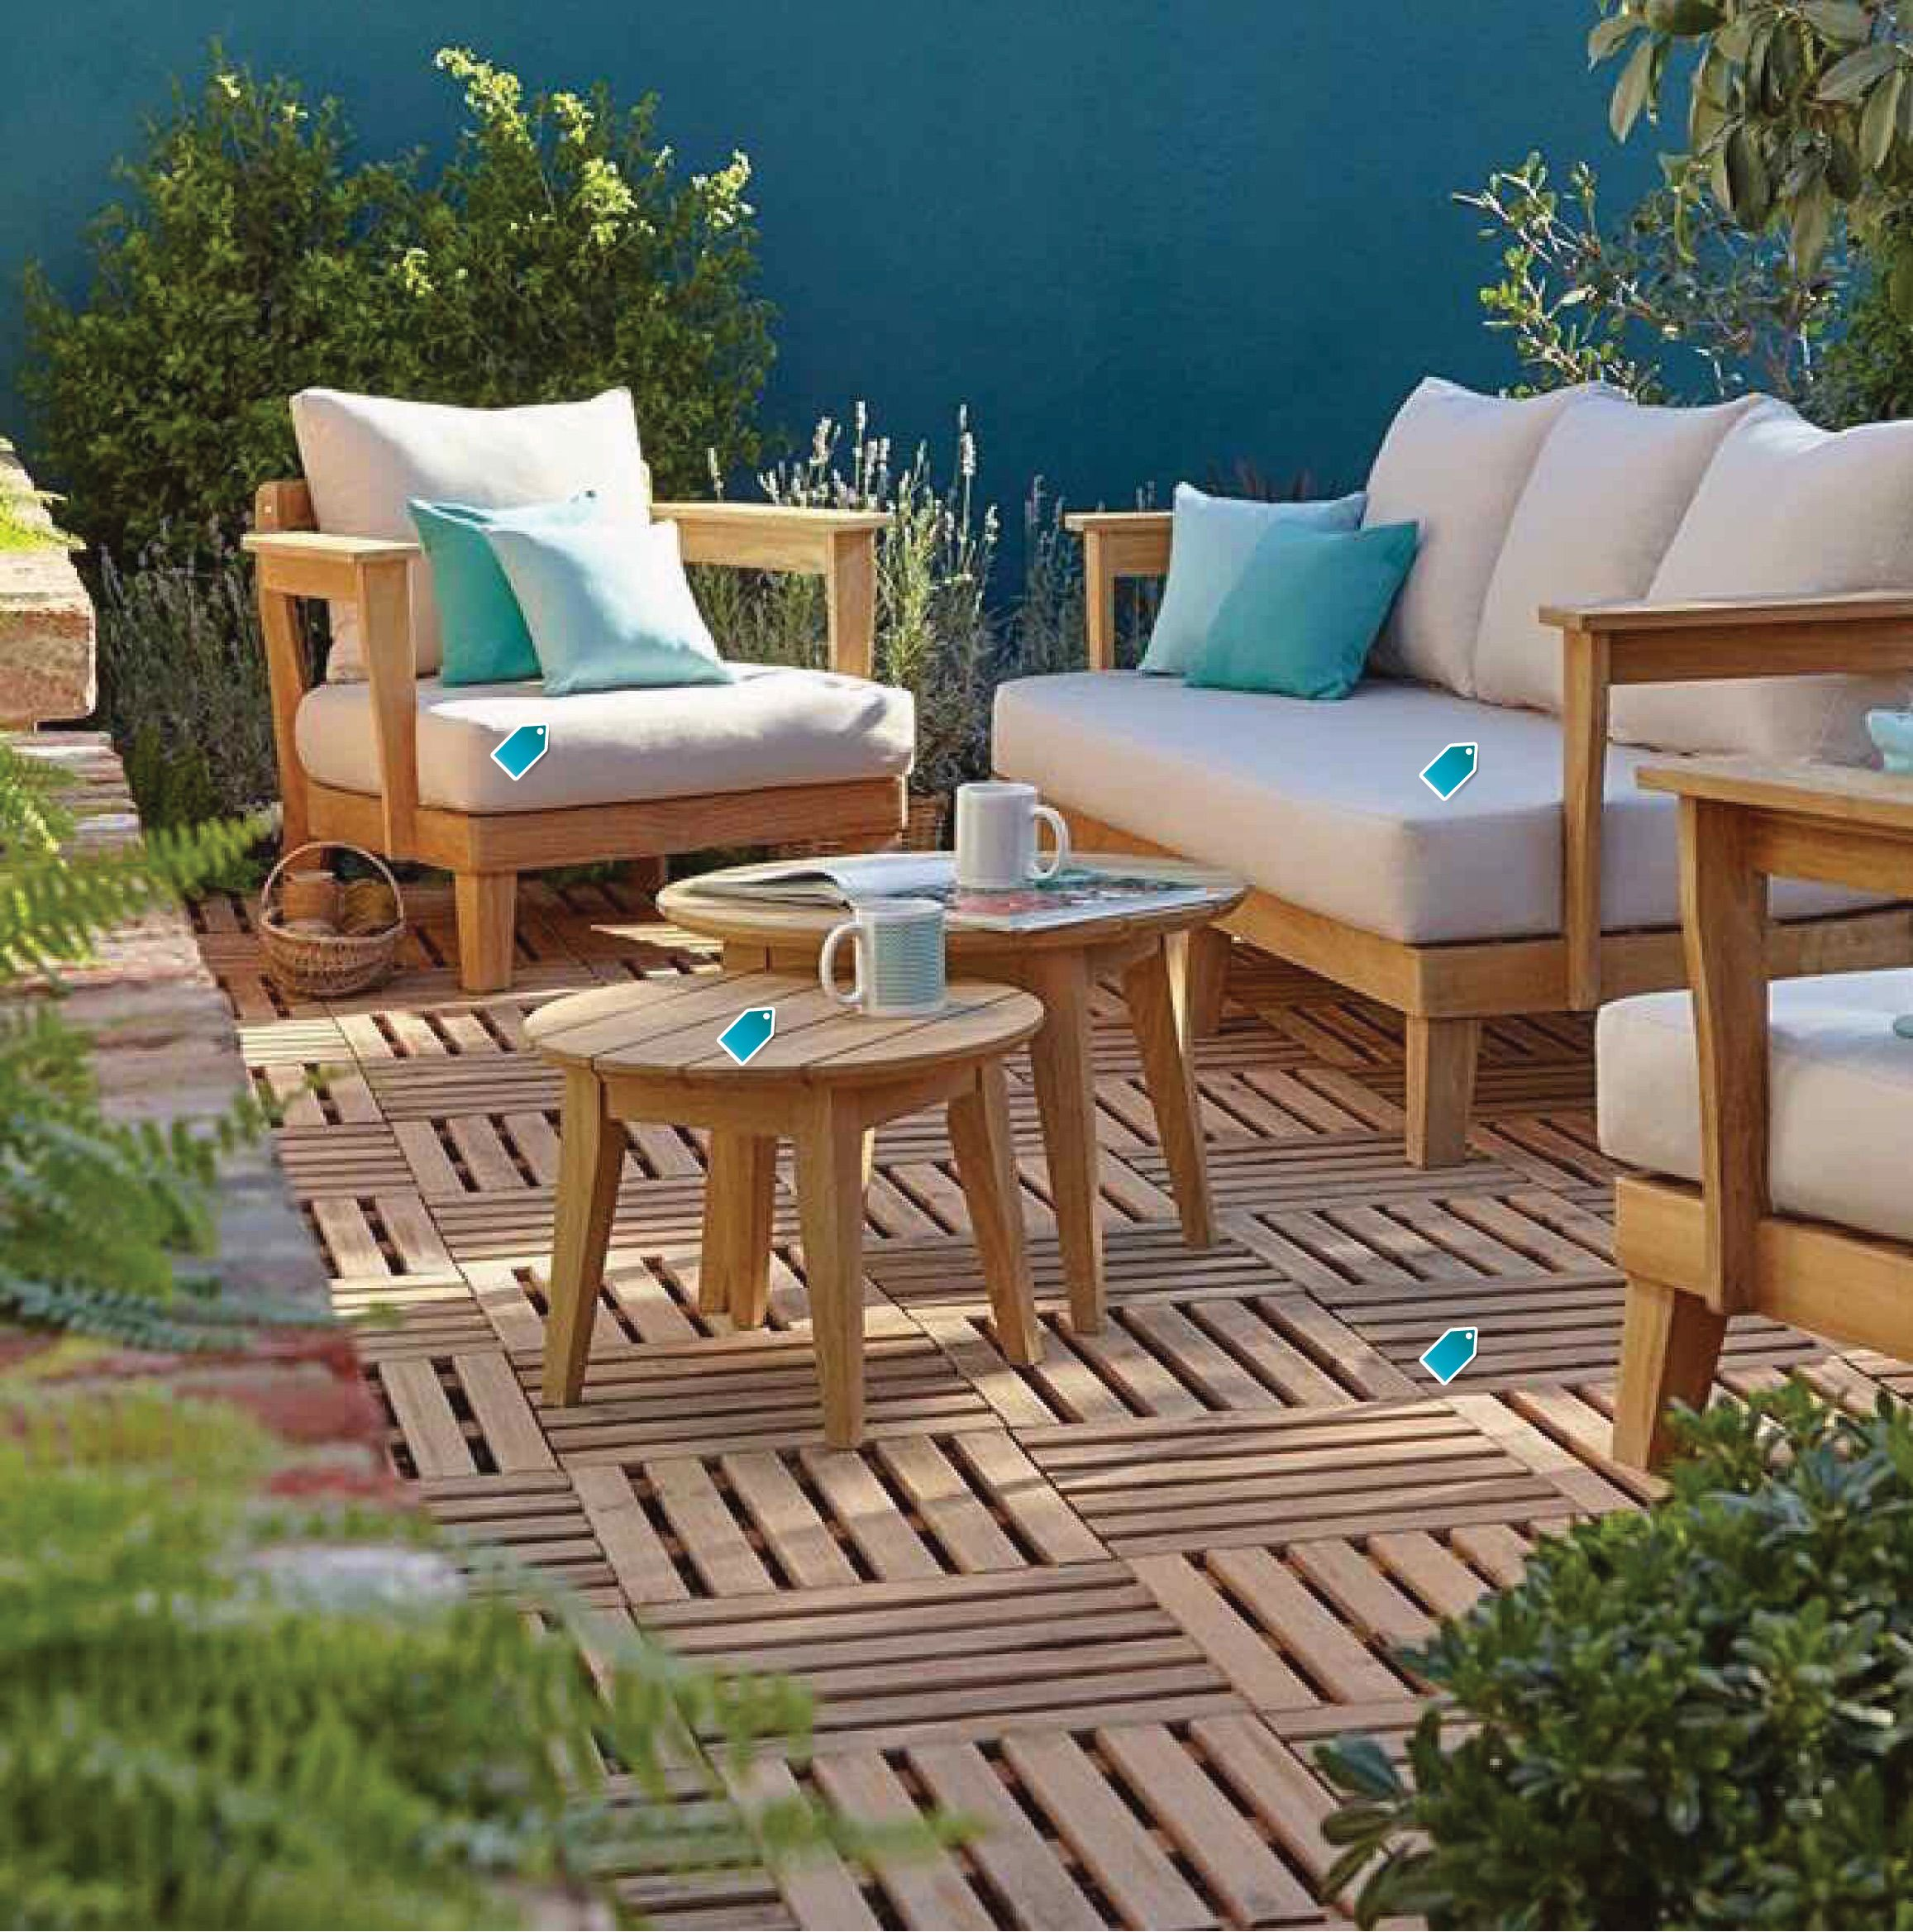 B And Q Garden Furniture